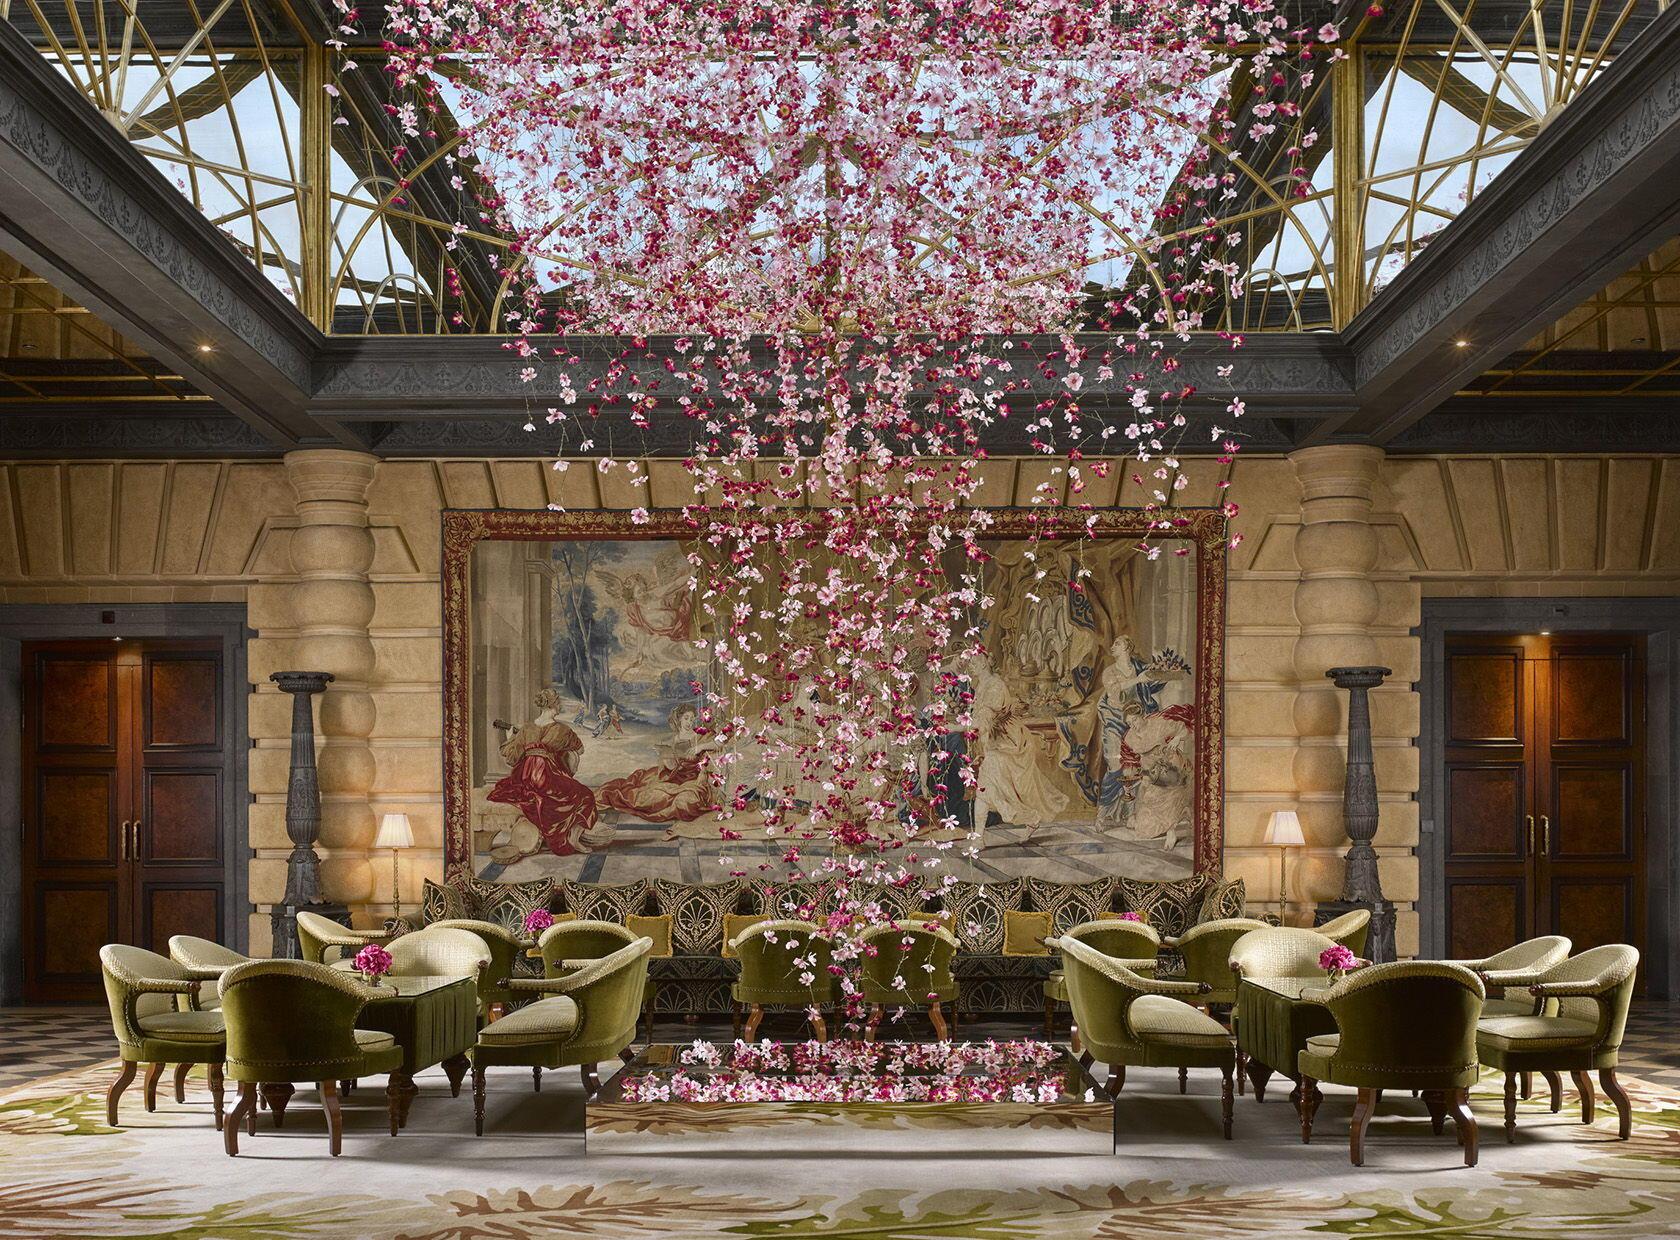 Hotel Metropole Monte-Carlo